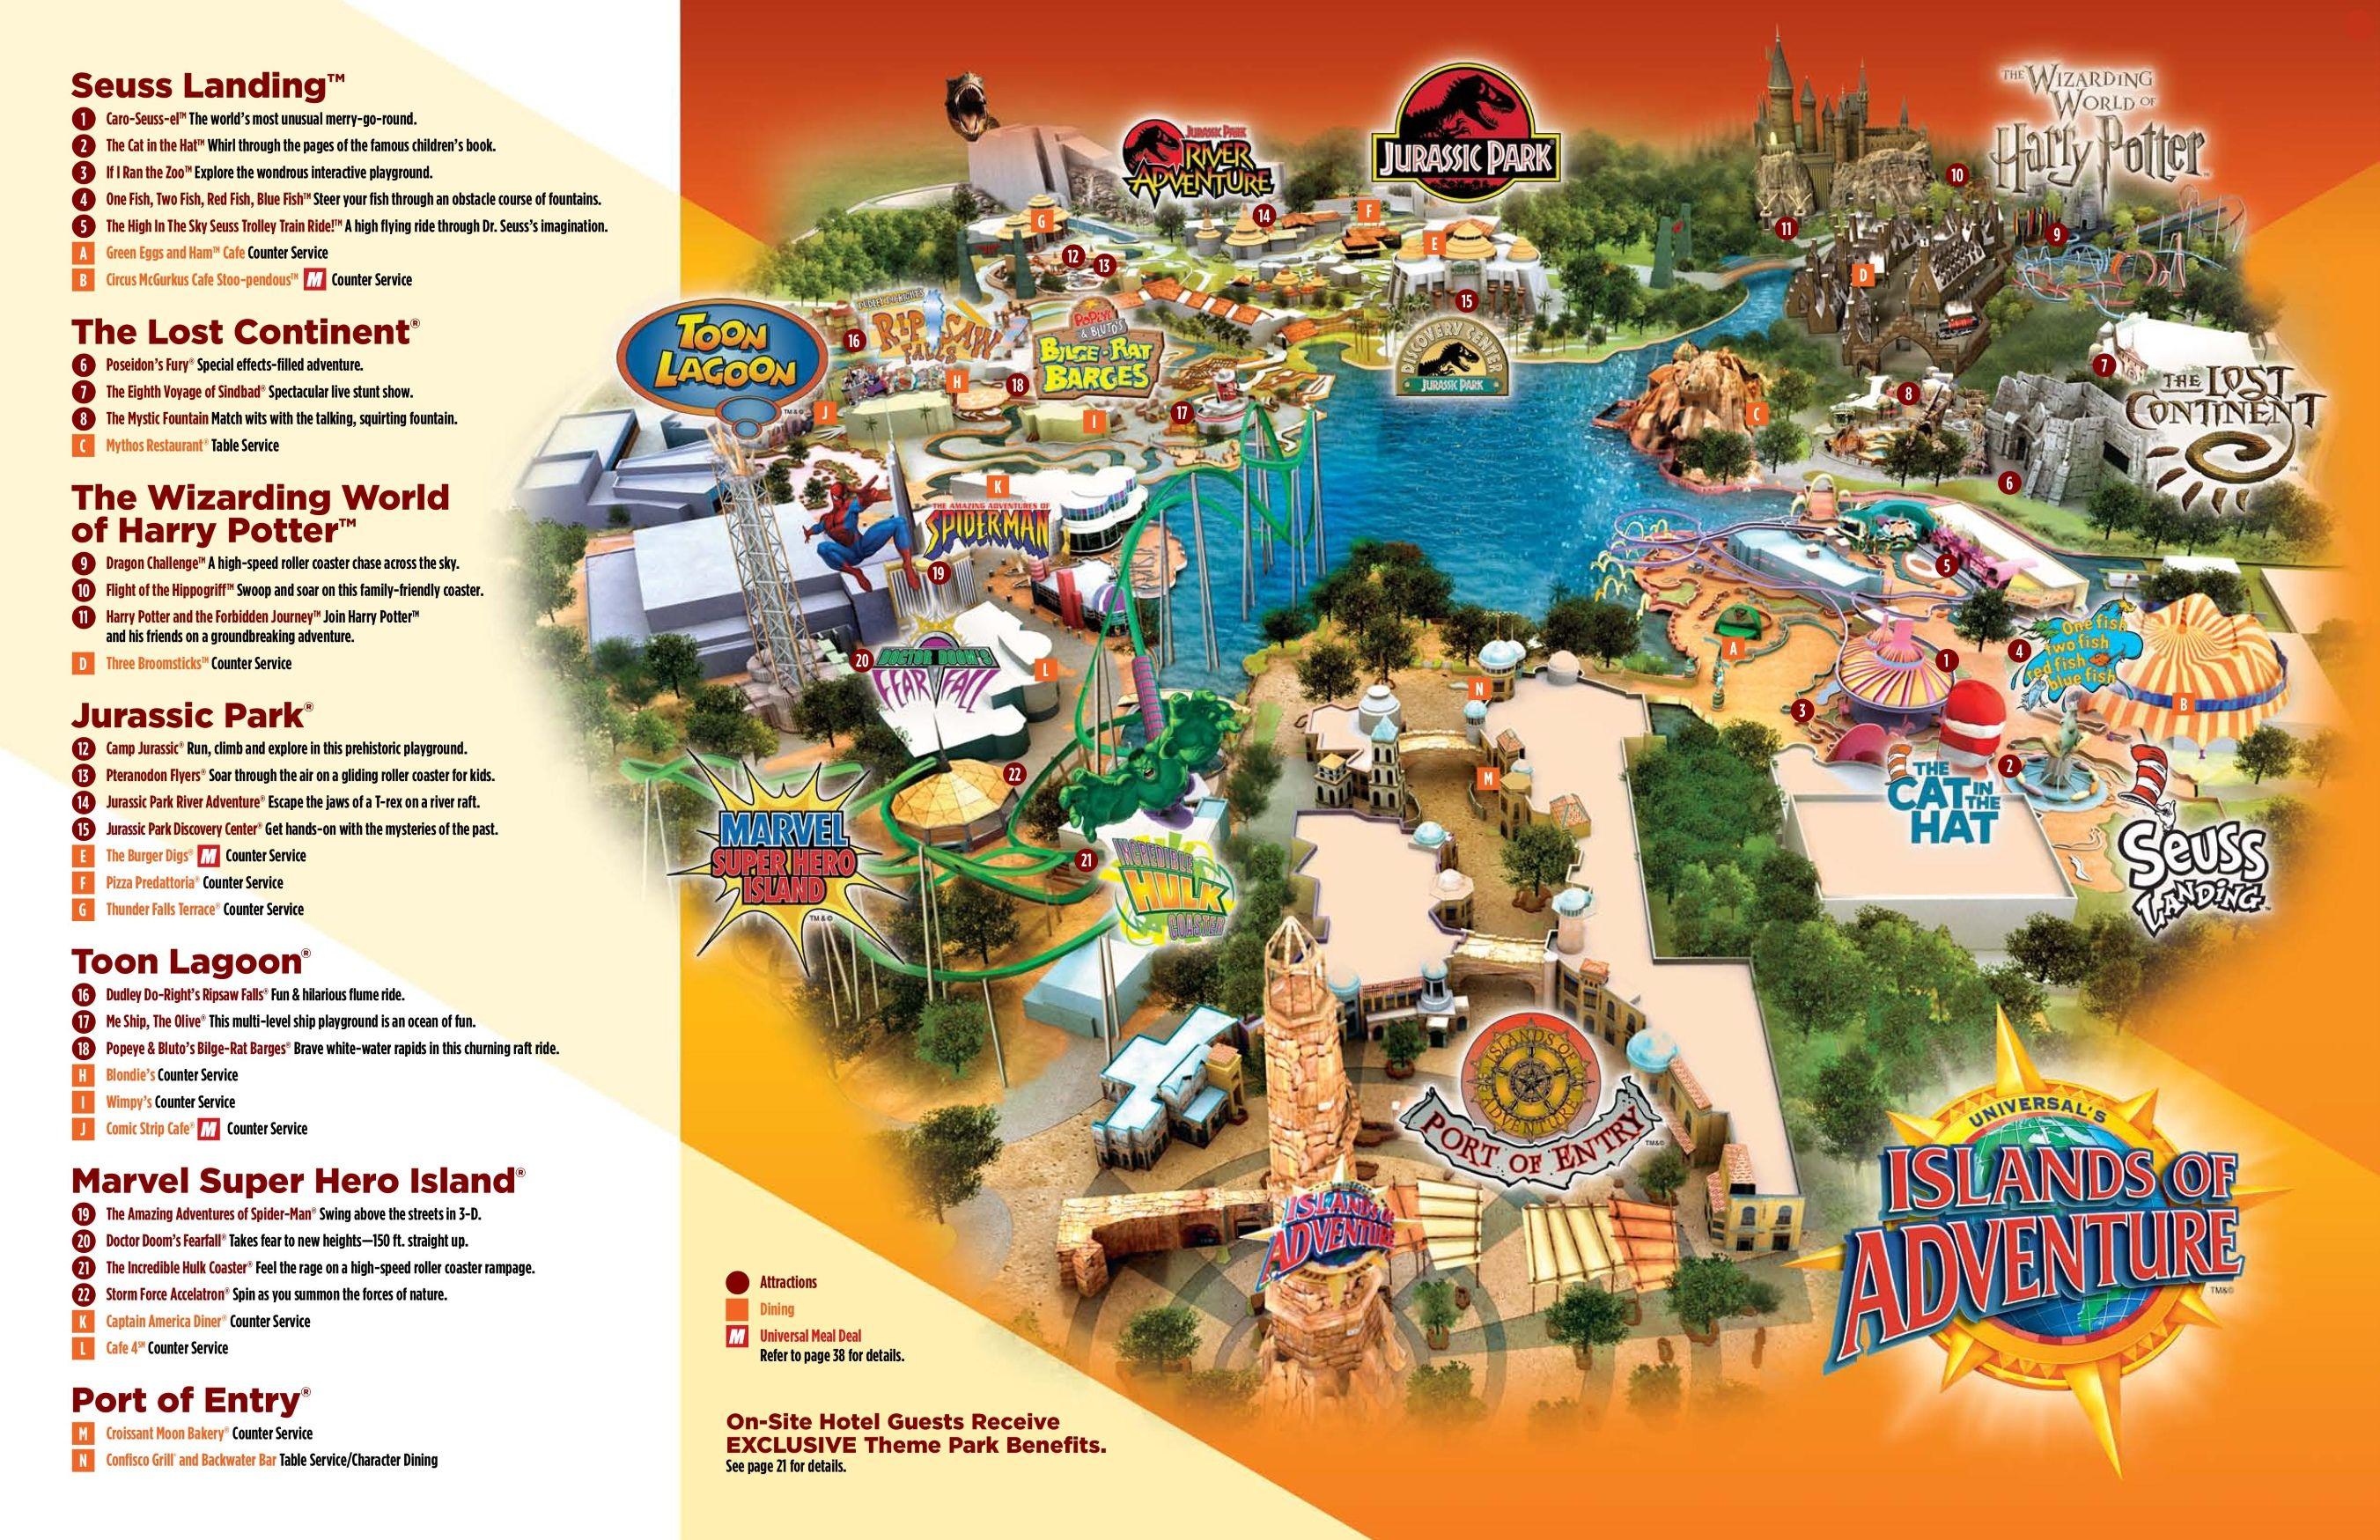 Orlando Islands Of Adventure Map Islands Of Adventure Adventure Map Island Of Adventure Orlando